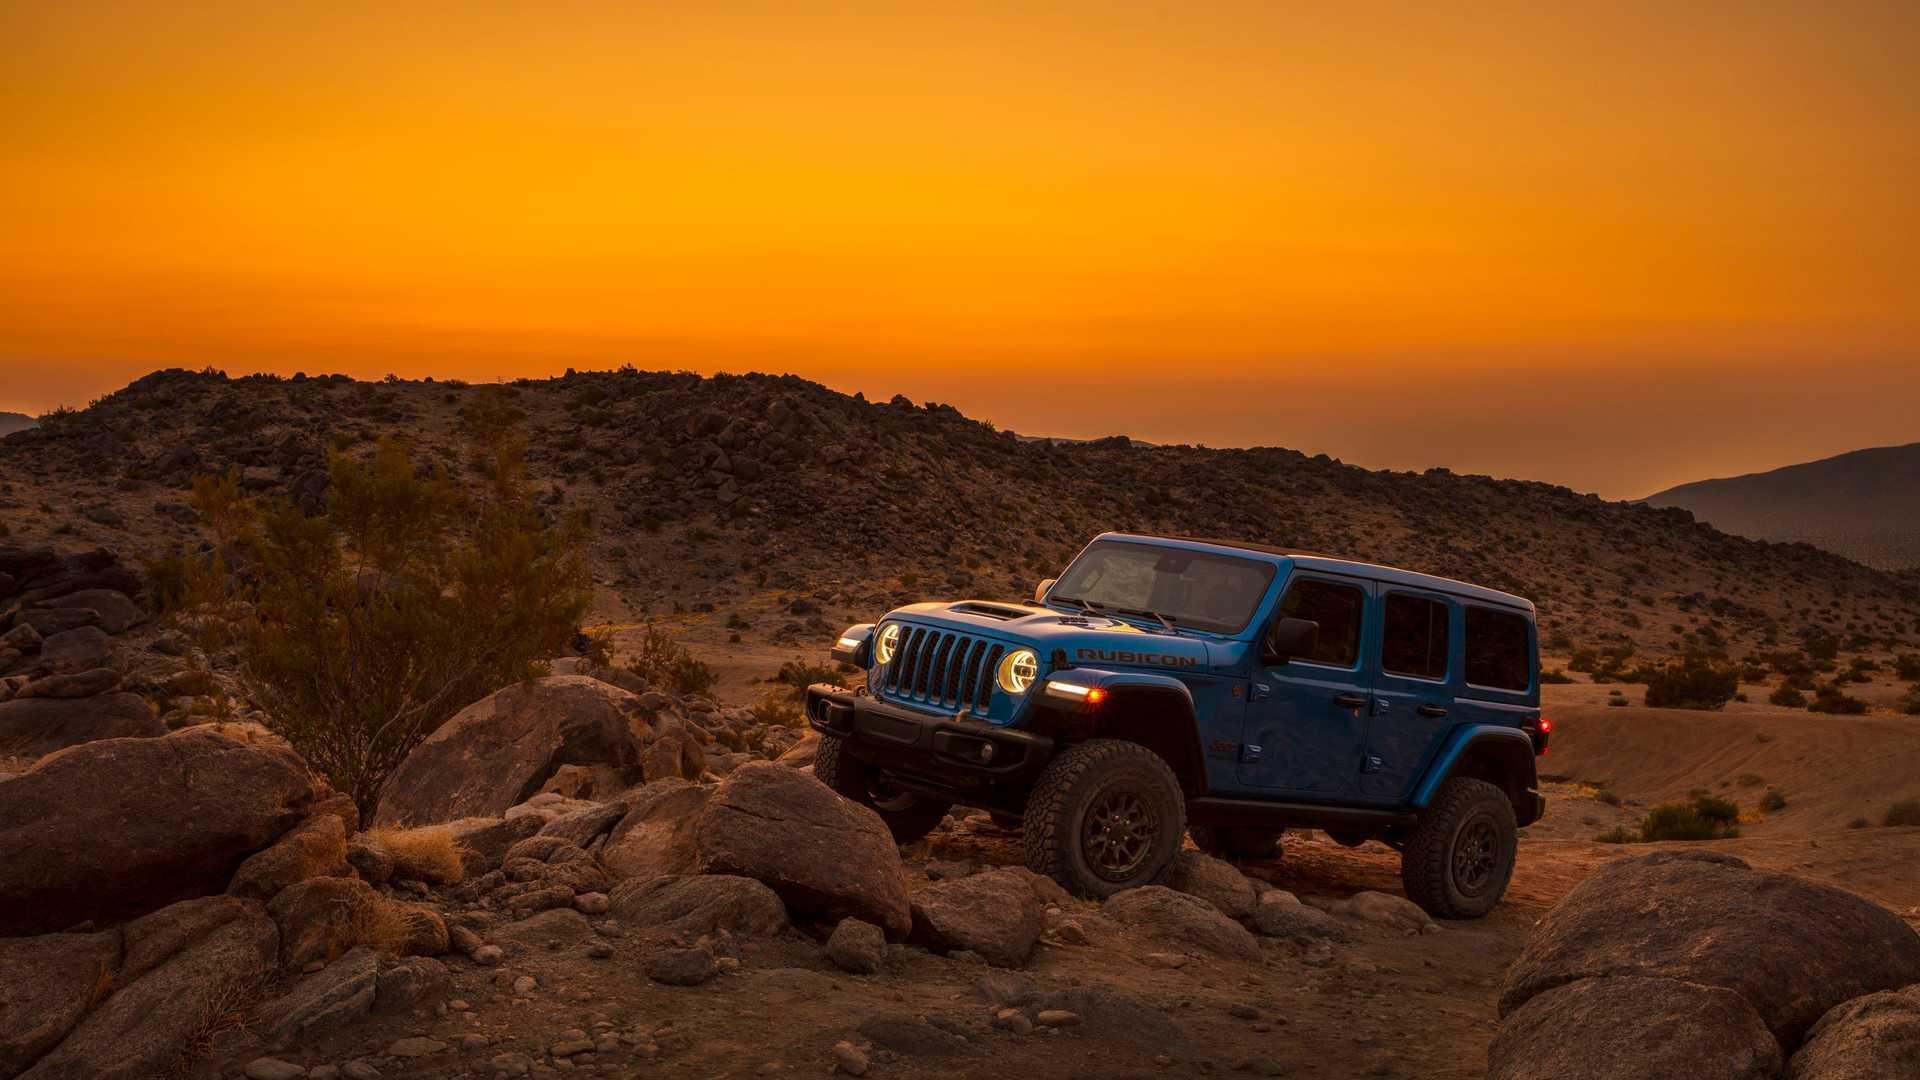 2021-jeep-wrangler-rubicon-392-front-view-2